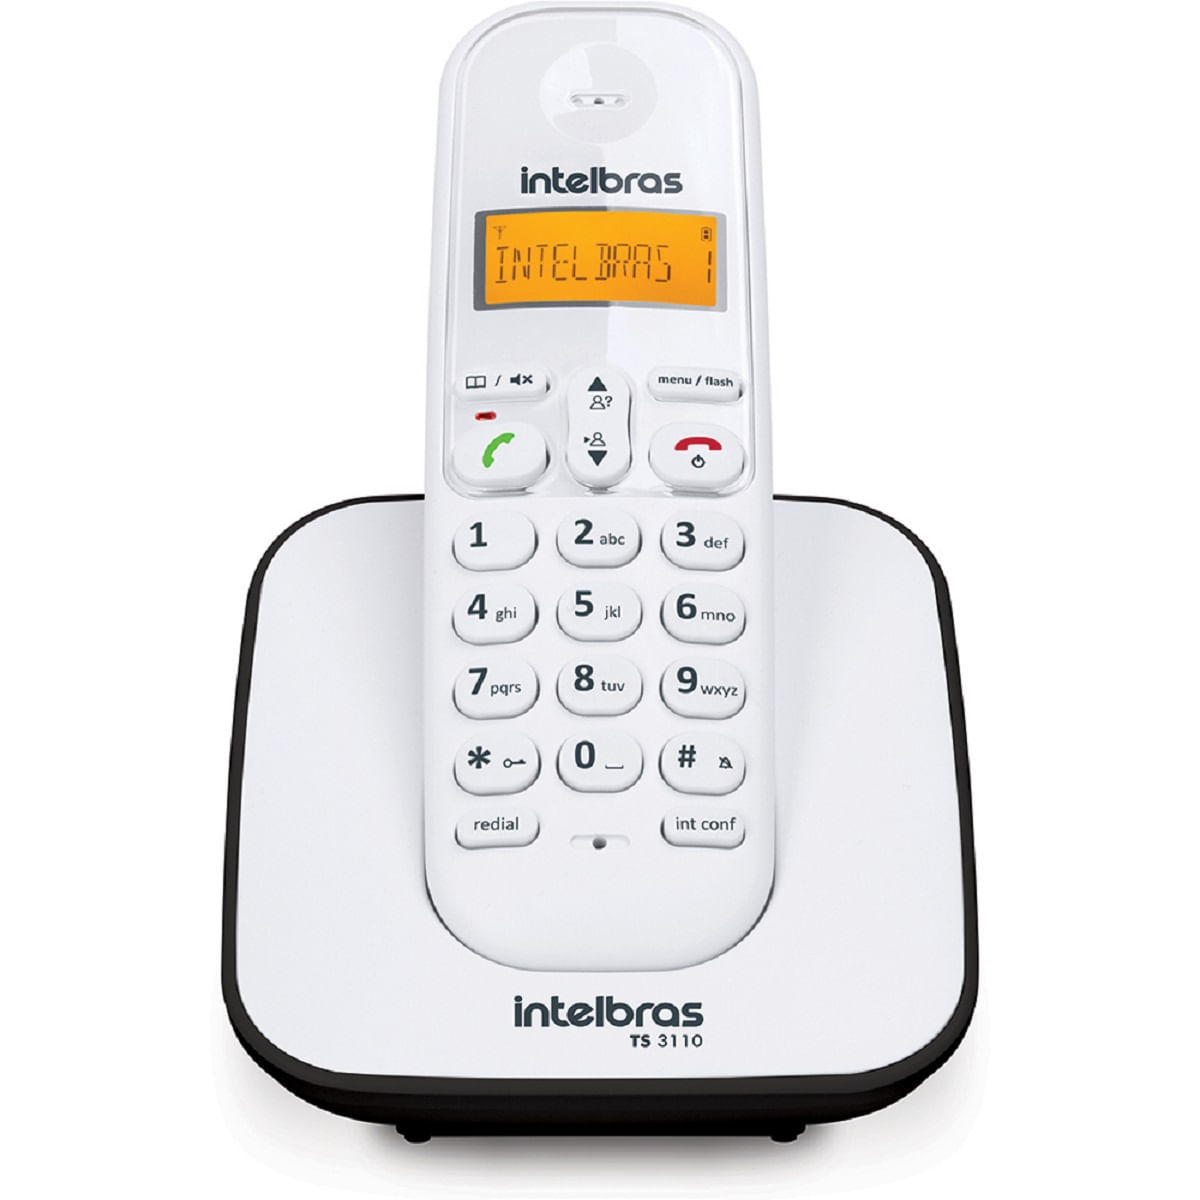 Telefone sem fio Intelbras TS 3110 Branco e Preto